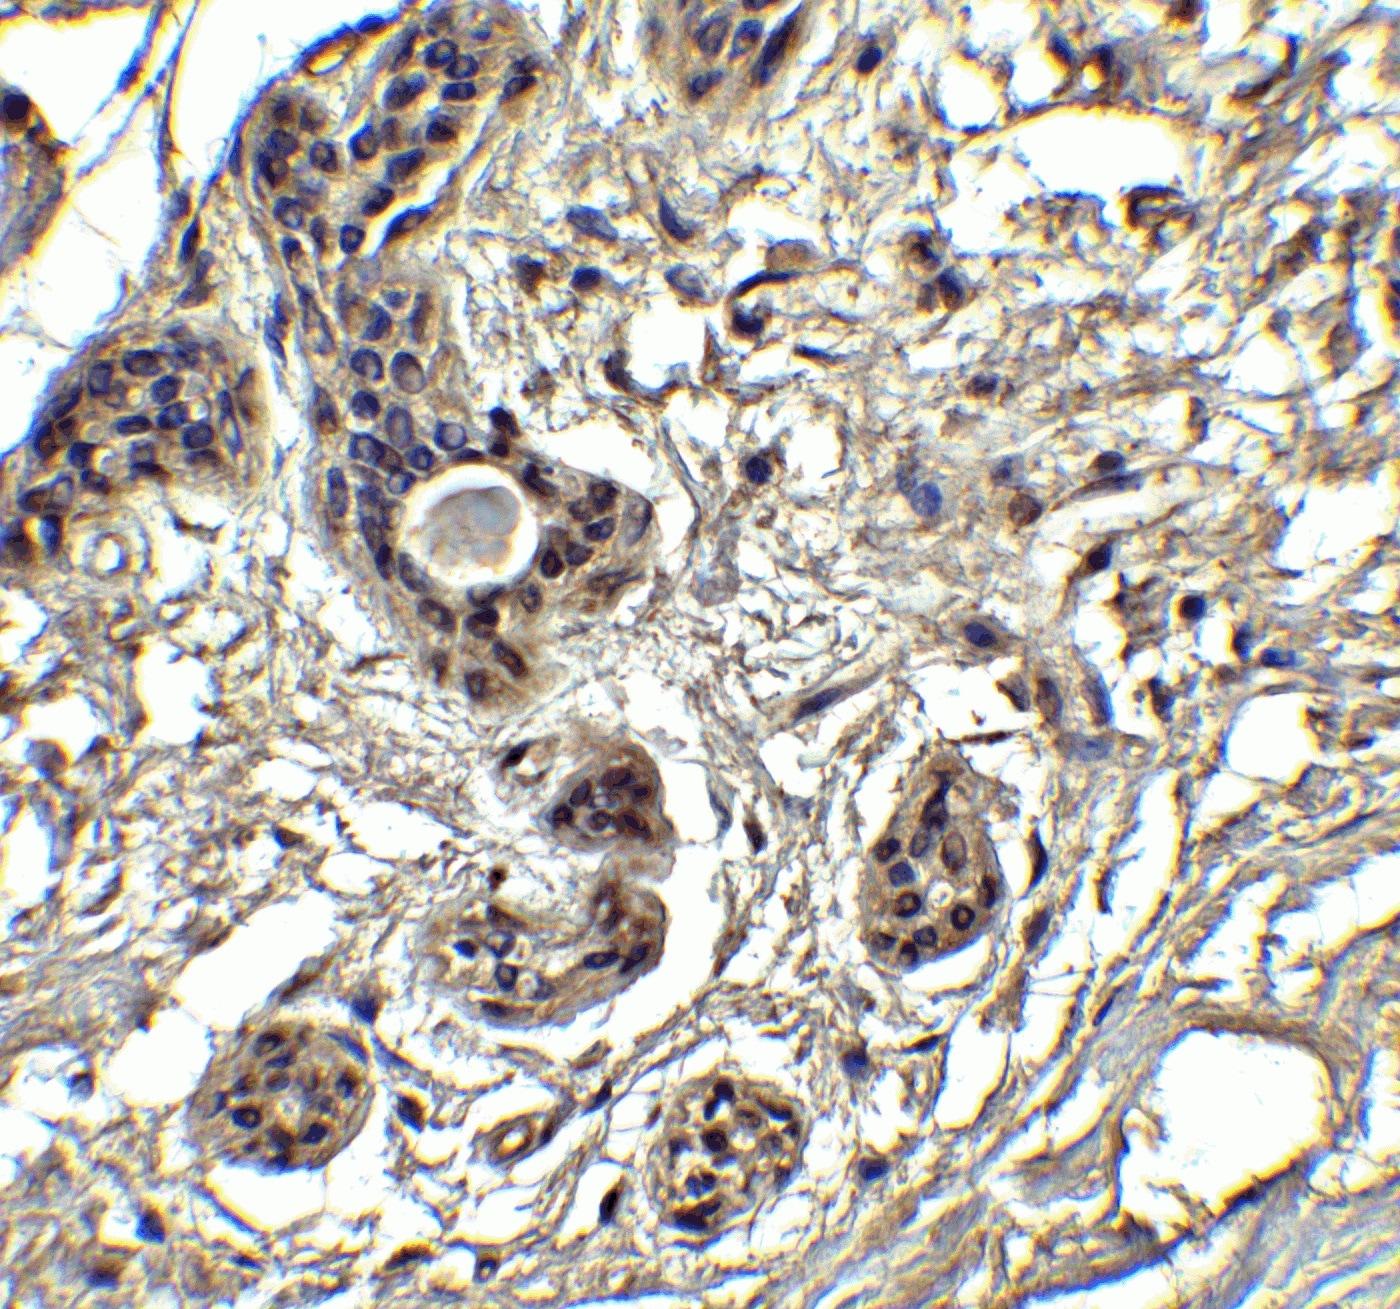 Immunohistochemistry (Formalin/PFA-fixed paraffin-embedded sections) - Anti-PUMA antibody (ab9645)